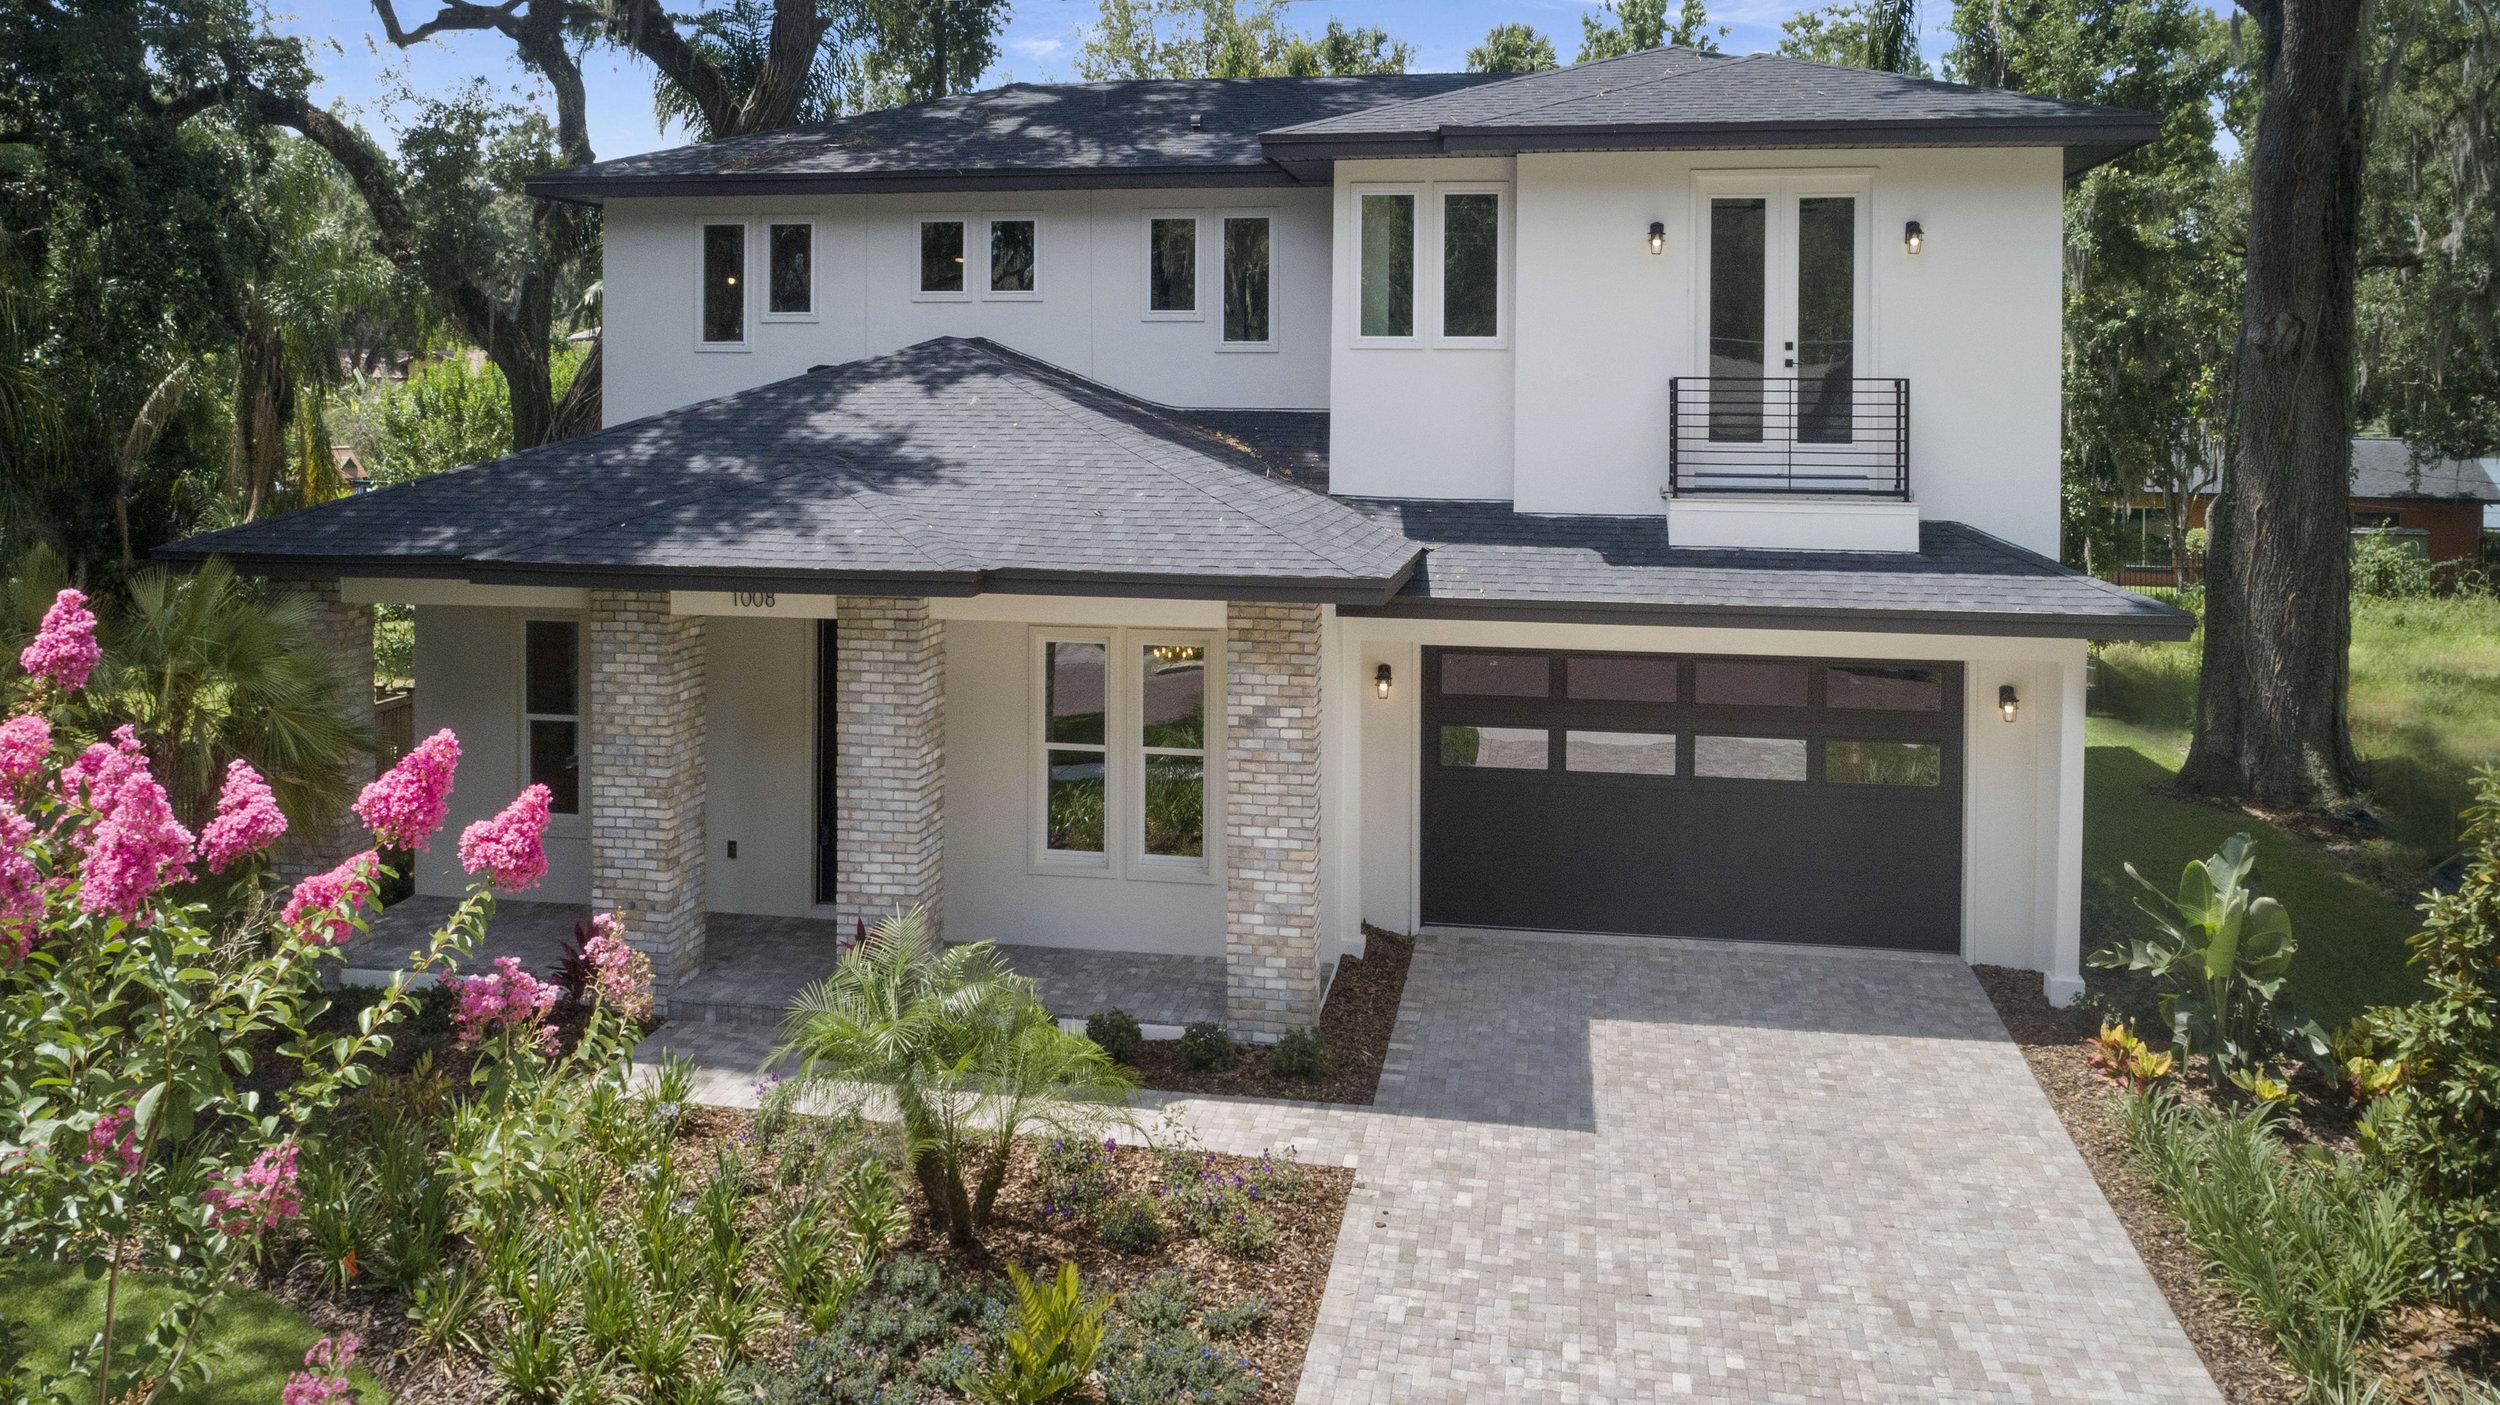 1008 Greenwood St, Orlando_DJI_0953.jpg